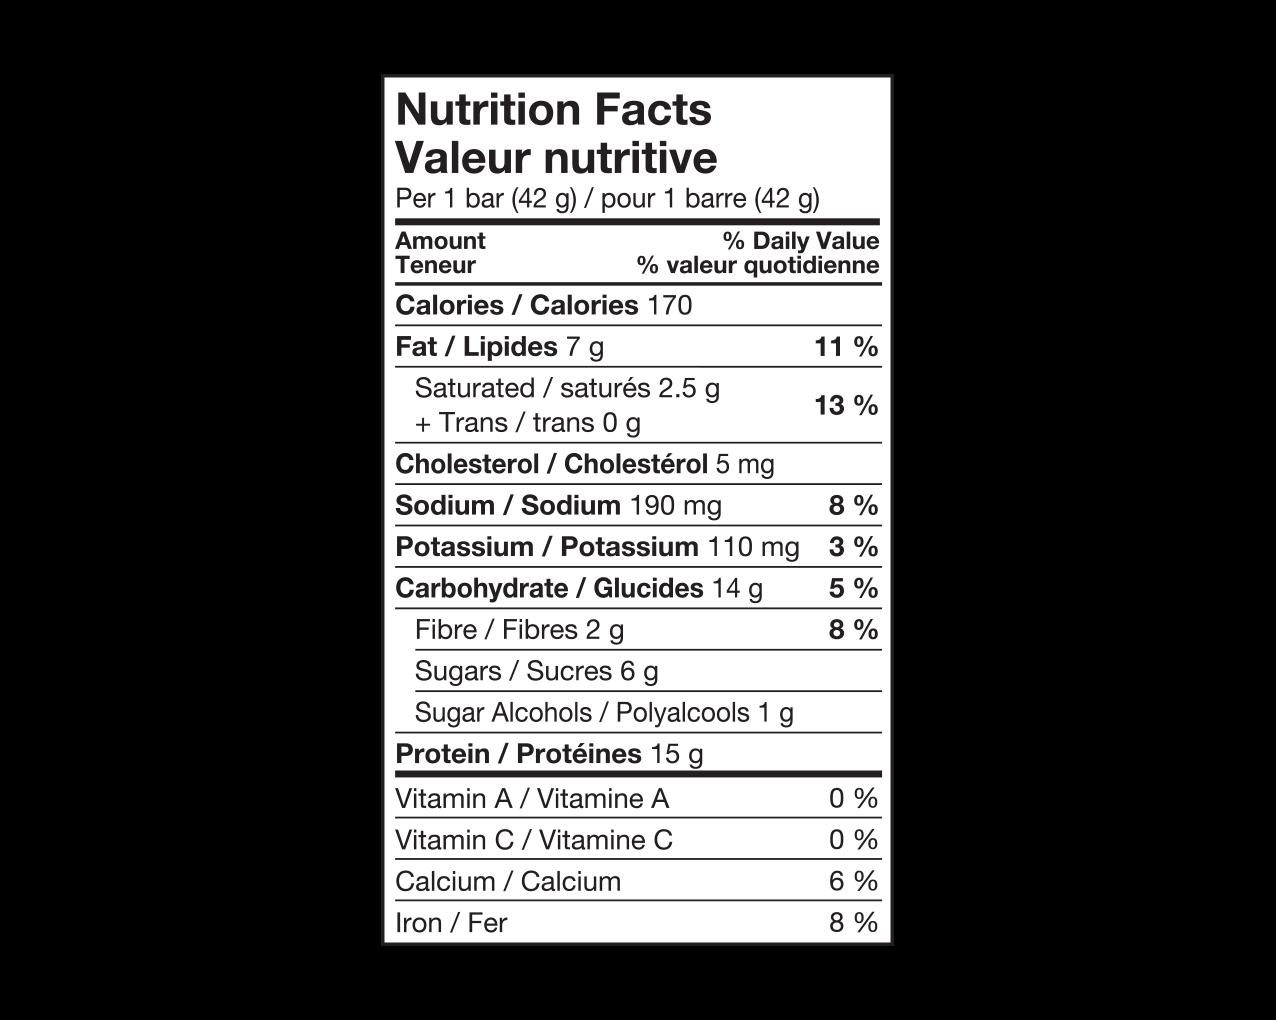 IdealProtein-Barre-beurre-darachide-Valeur-Nutritive